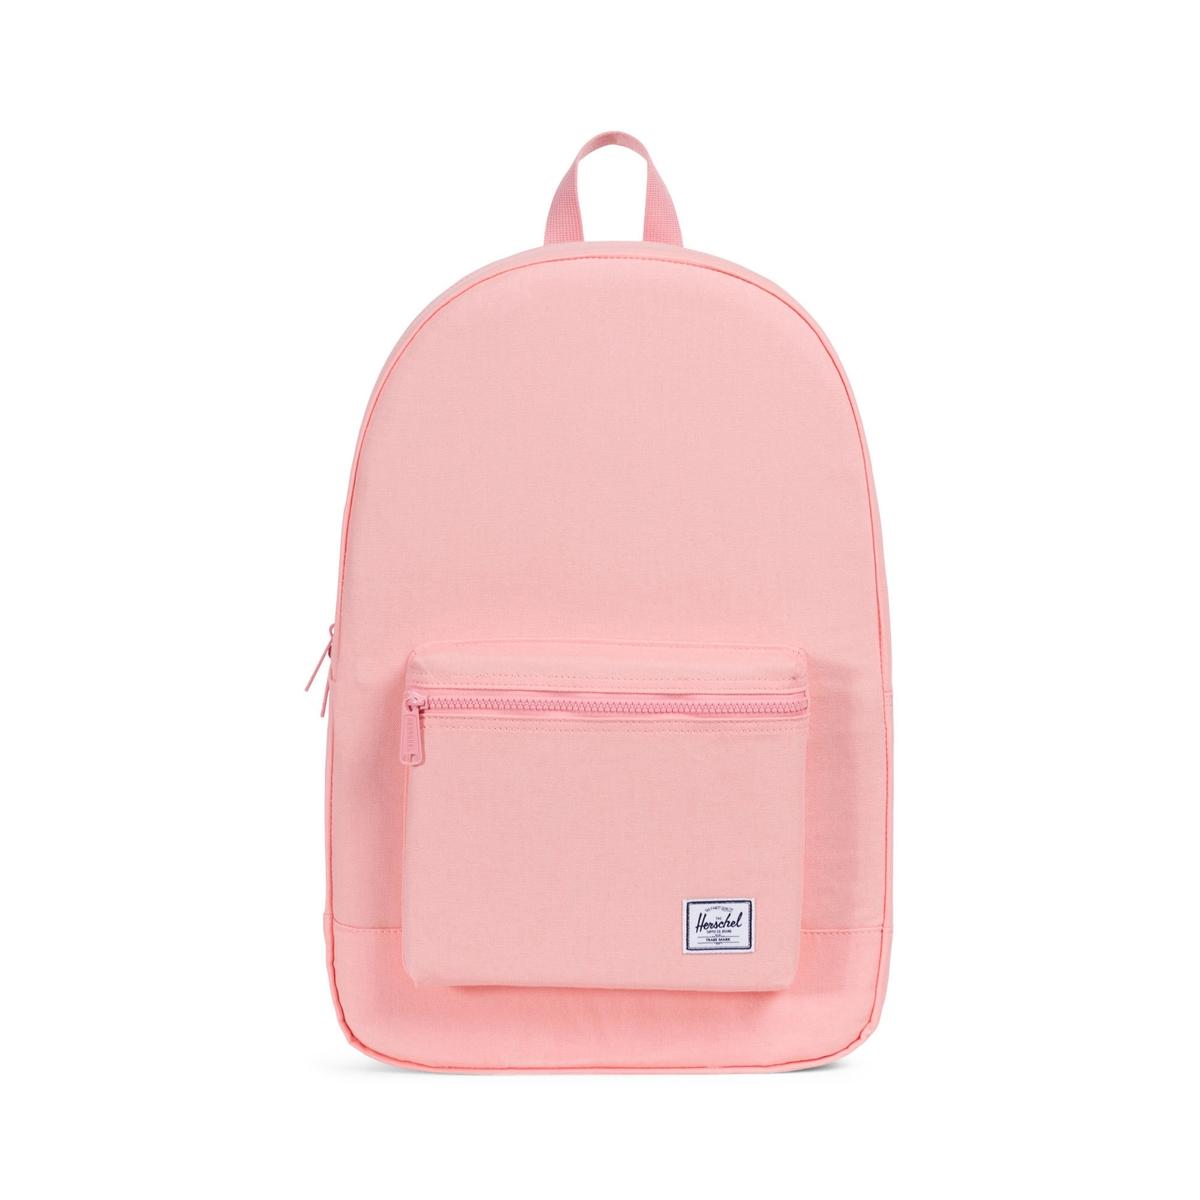 Рюкзак однотонный DAYPACK 24,5L рюкзак arcteryx 14467 astri 19 daypack